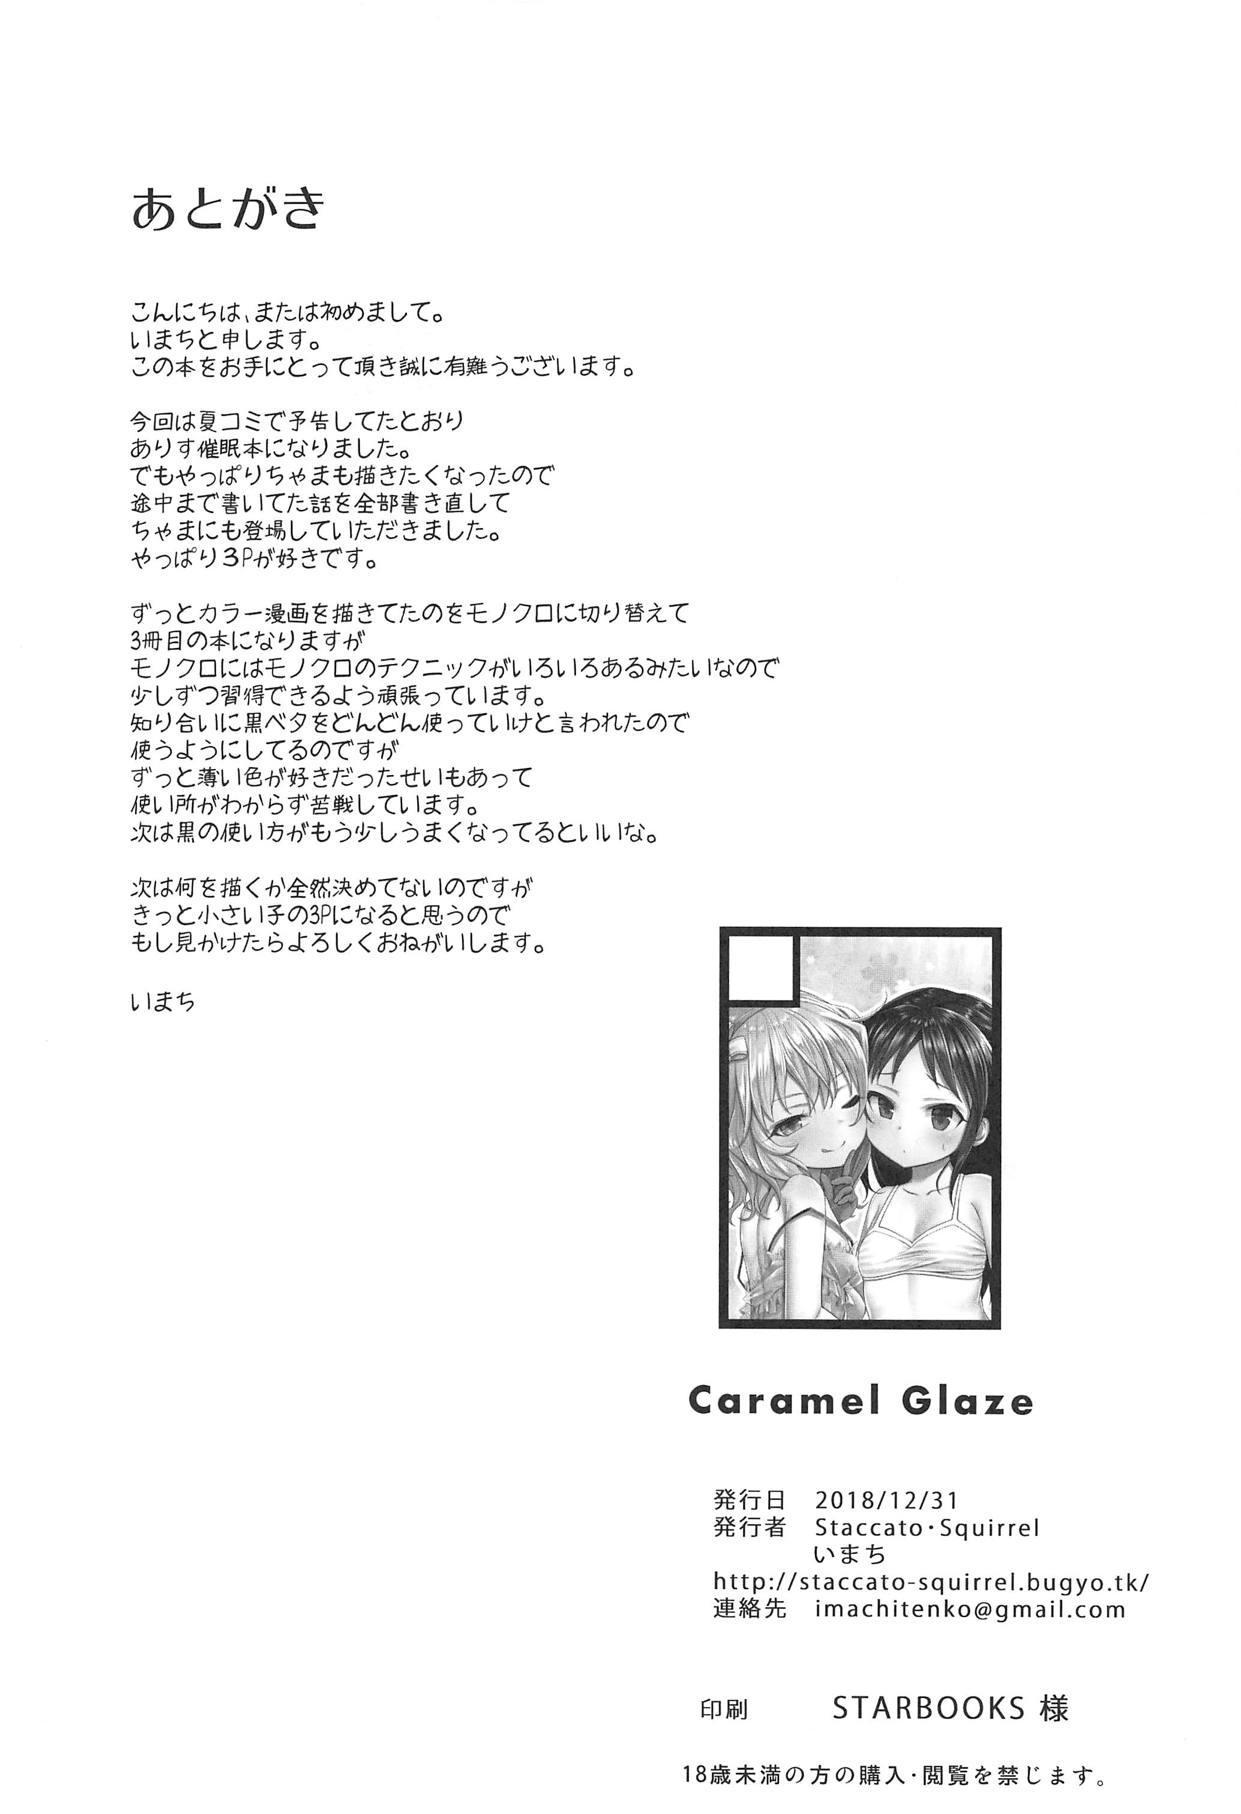 Caramel Glaze 24